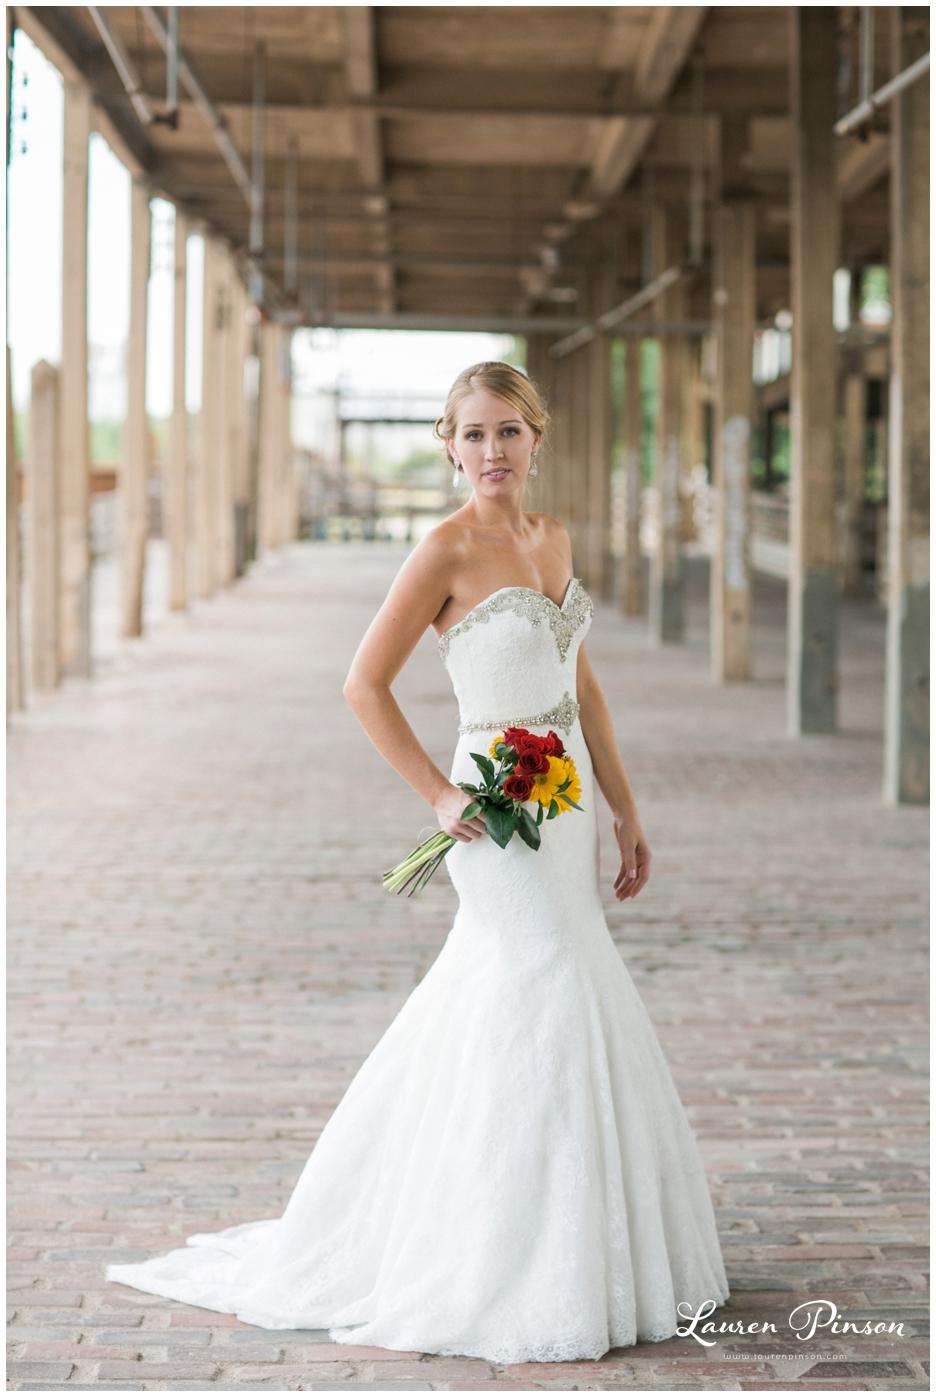 fort-worth-bridal-session-at-the-stockyards-fort-worth-wedding-photographer-wichita-falls-wedding-photographer_1329.jpg